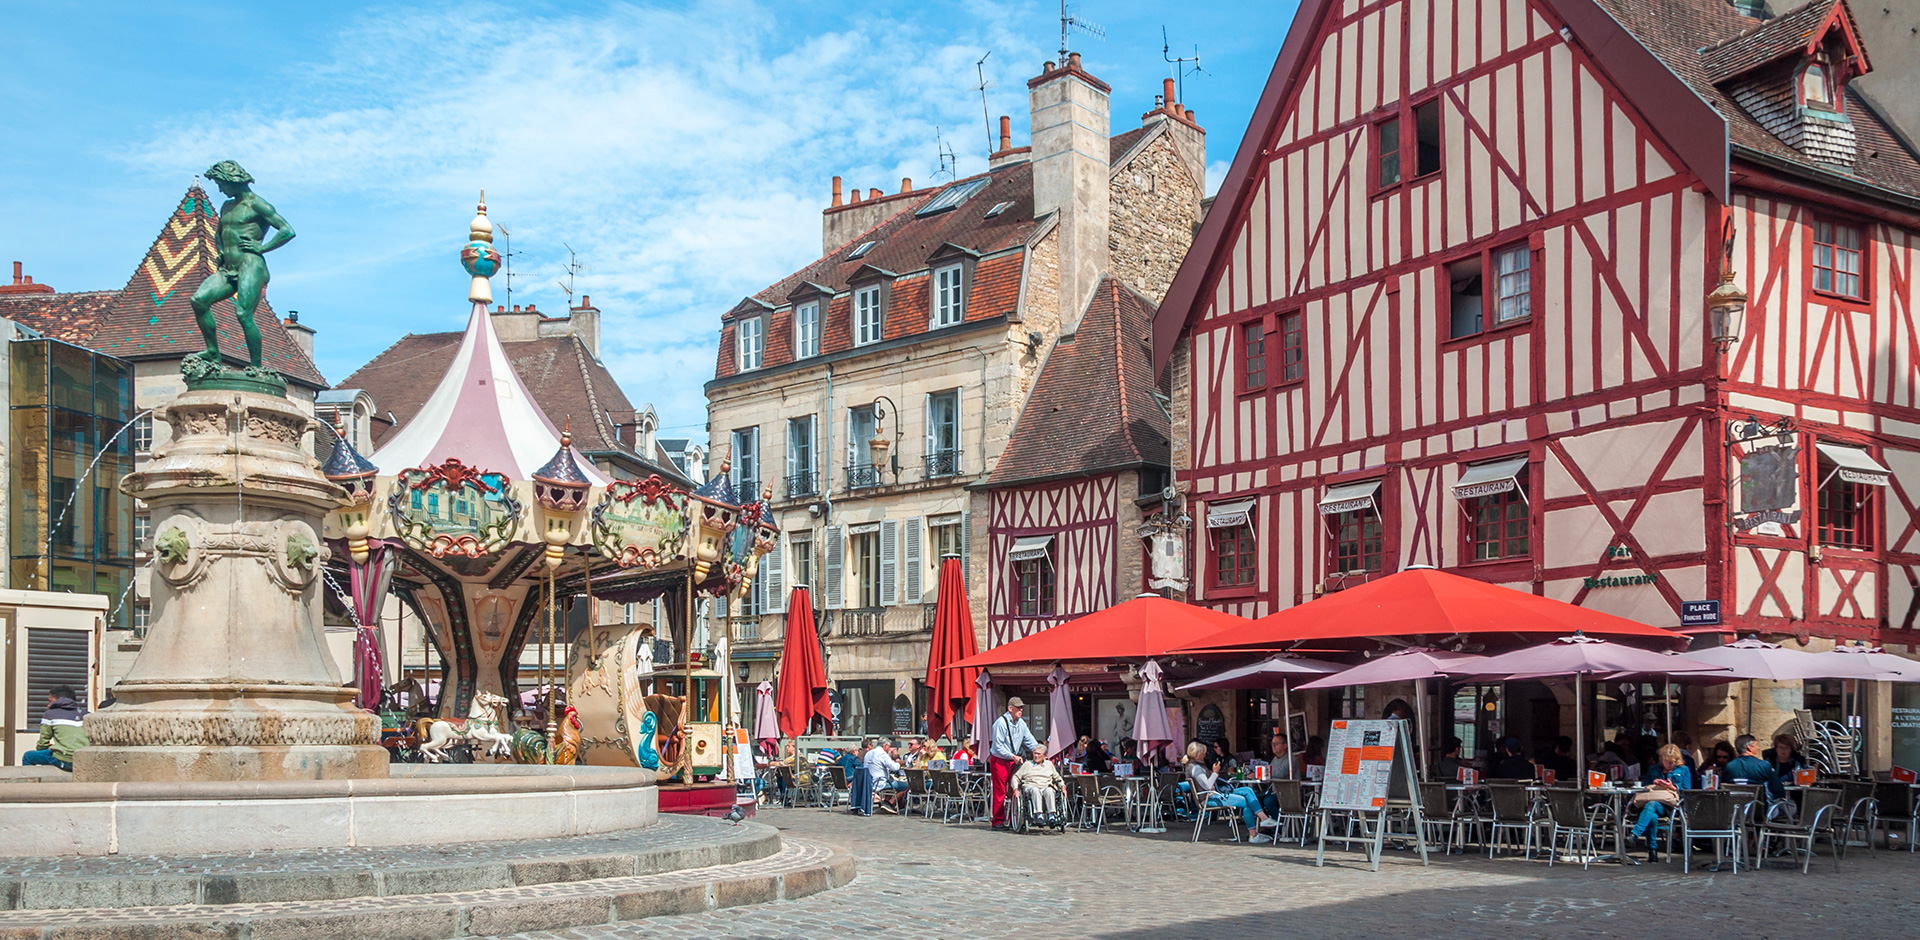 Gestion de patrimoine Dijon